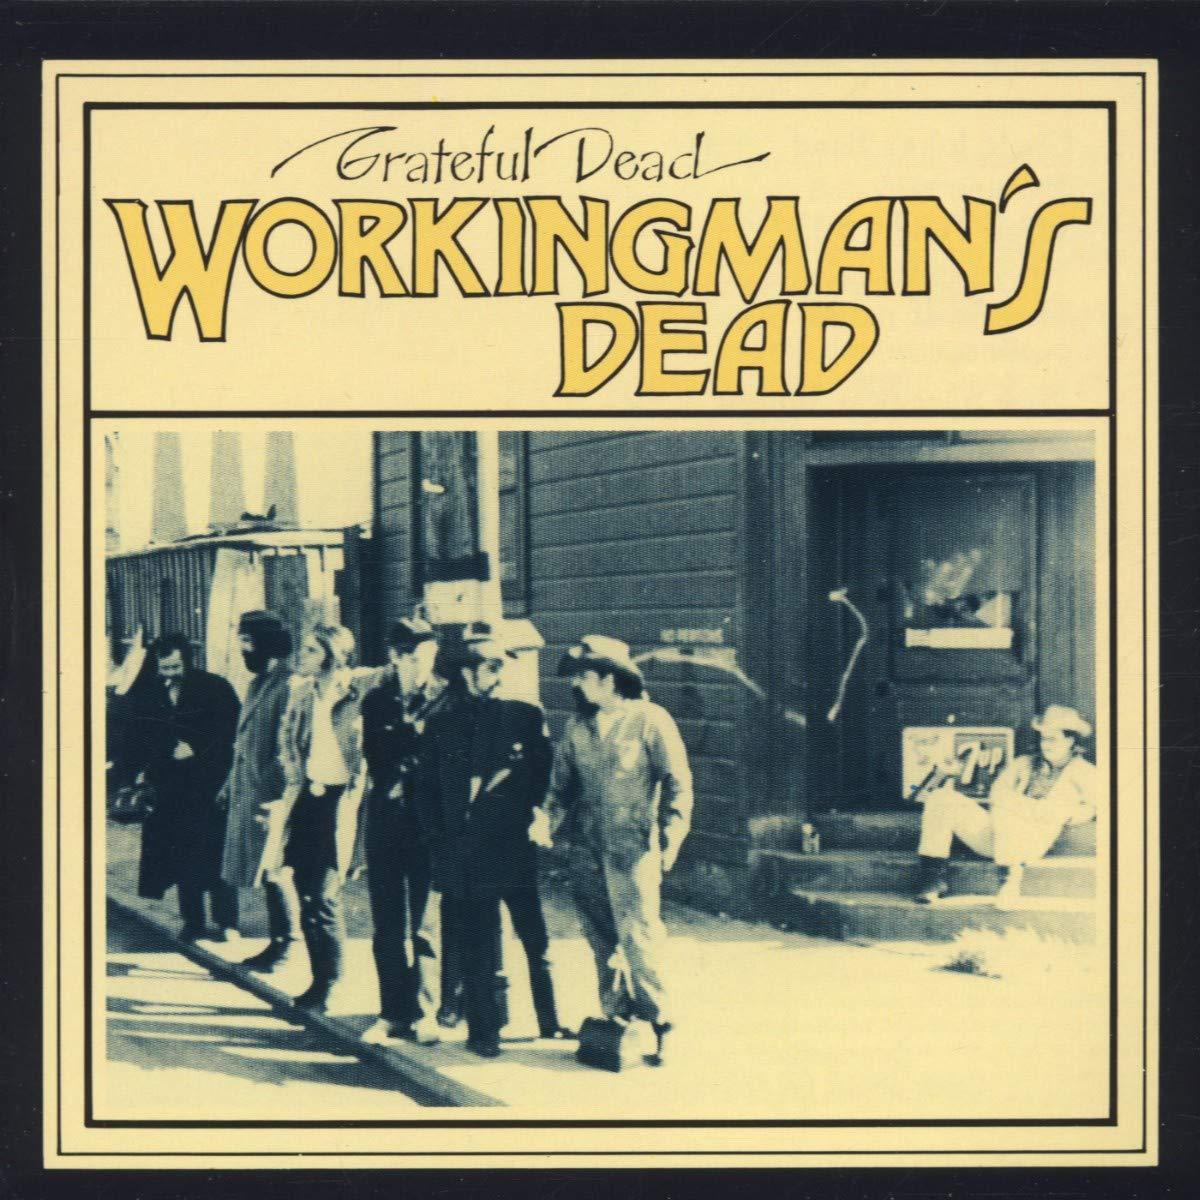 GRATEFUL DEAD - Workingman's Dead - Amazon.com Music